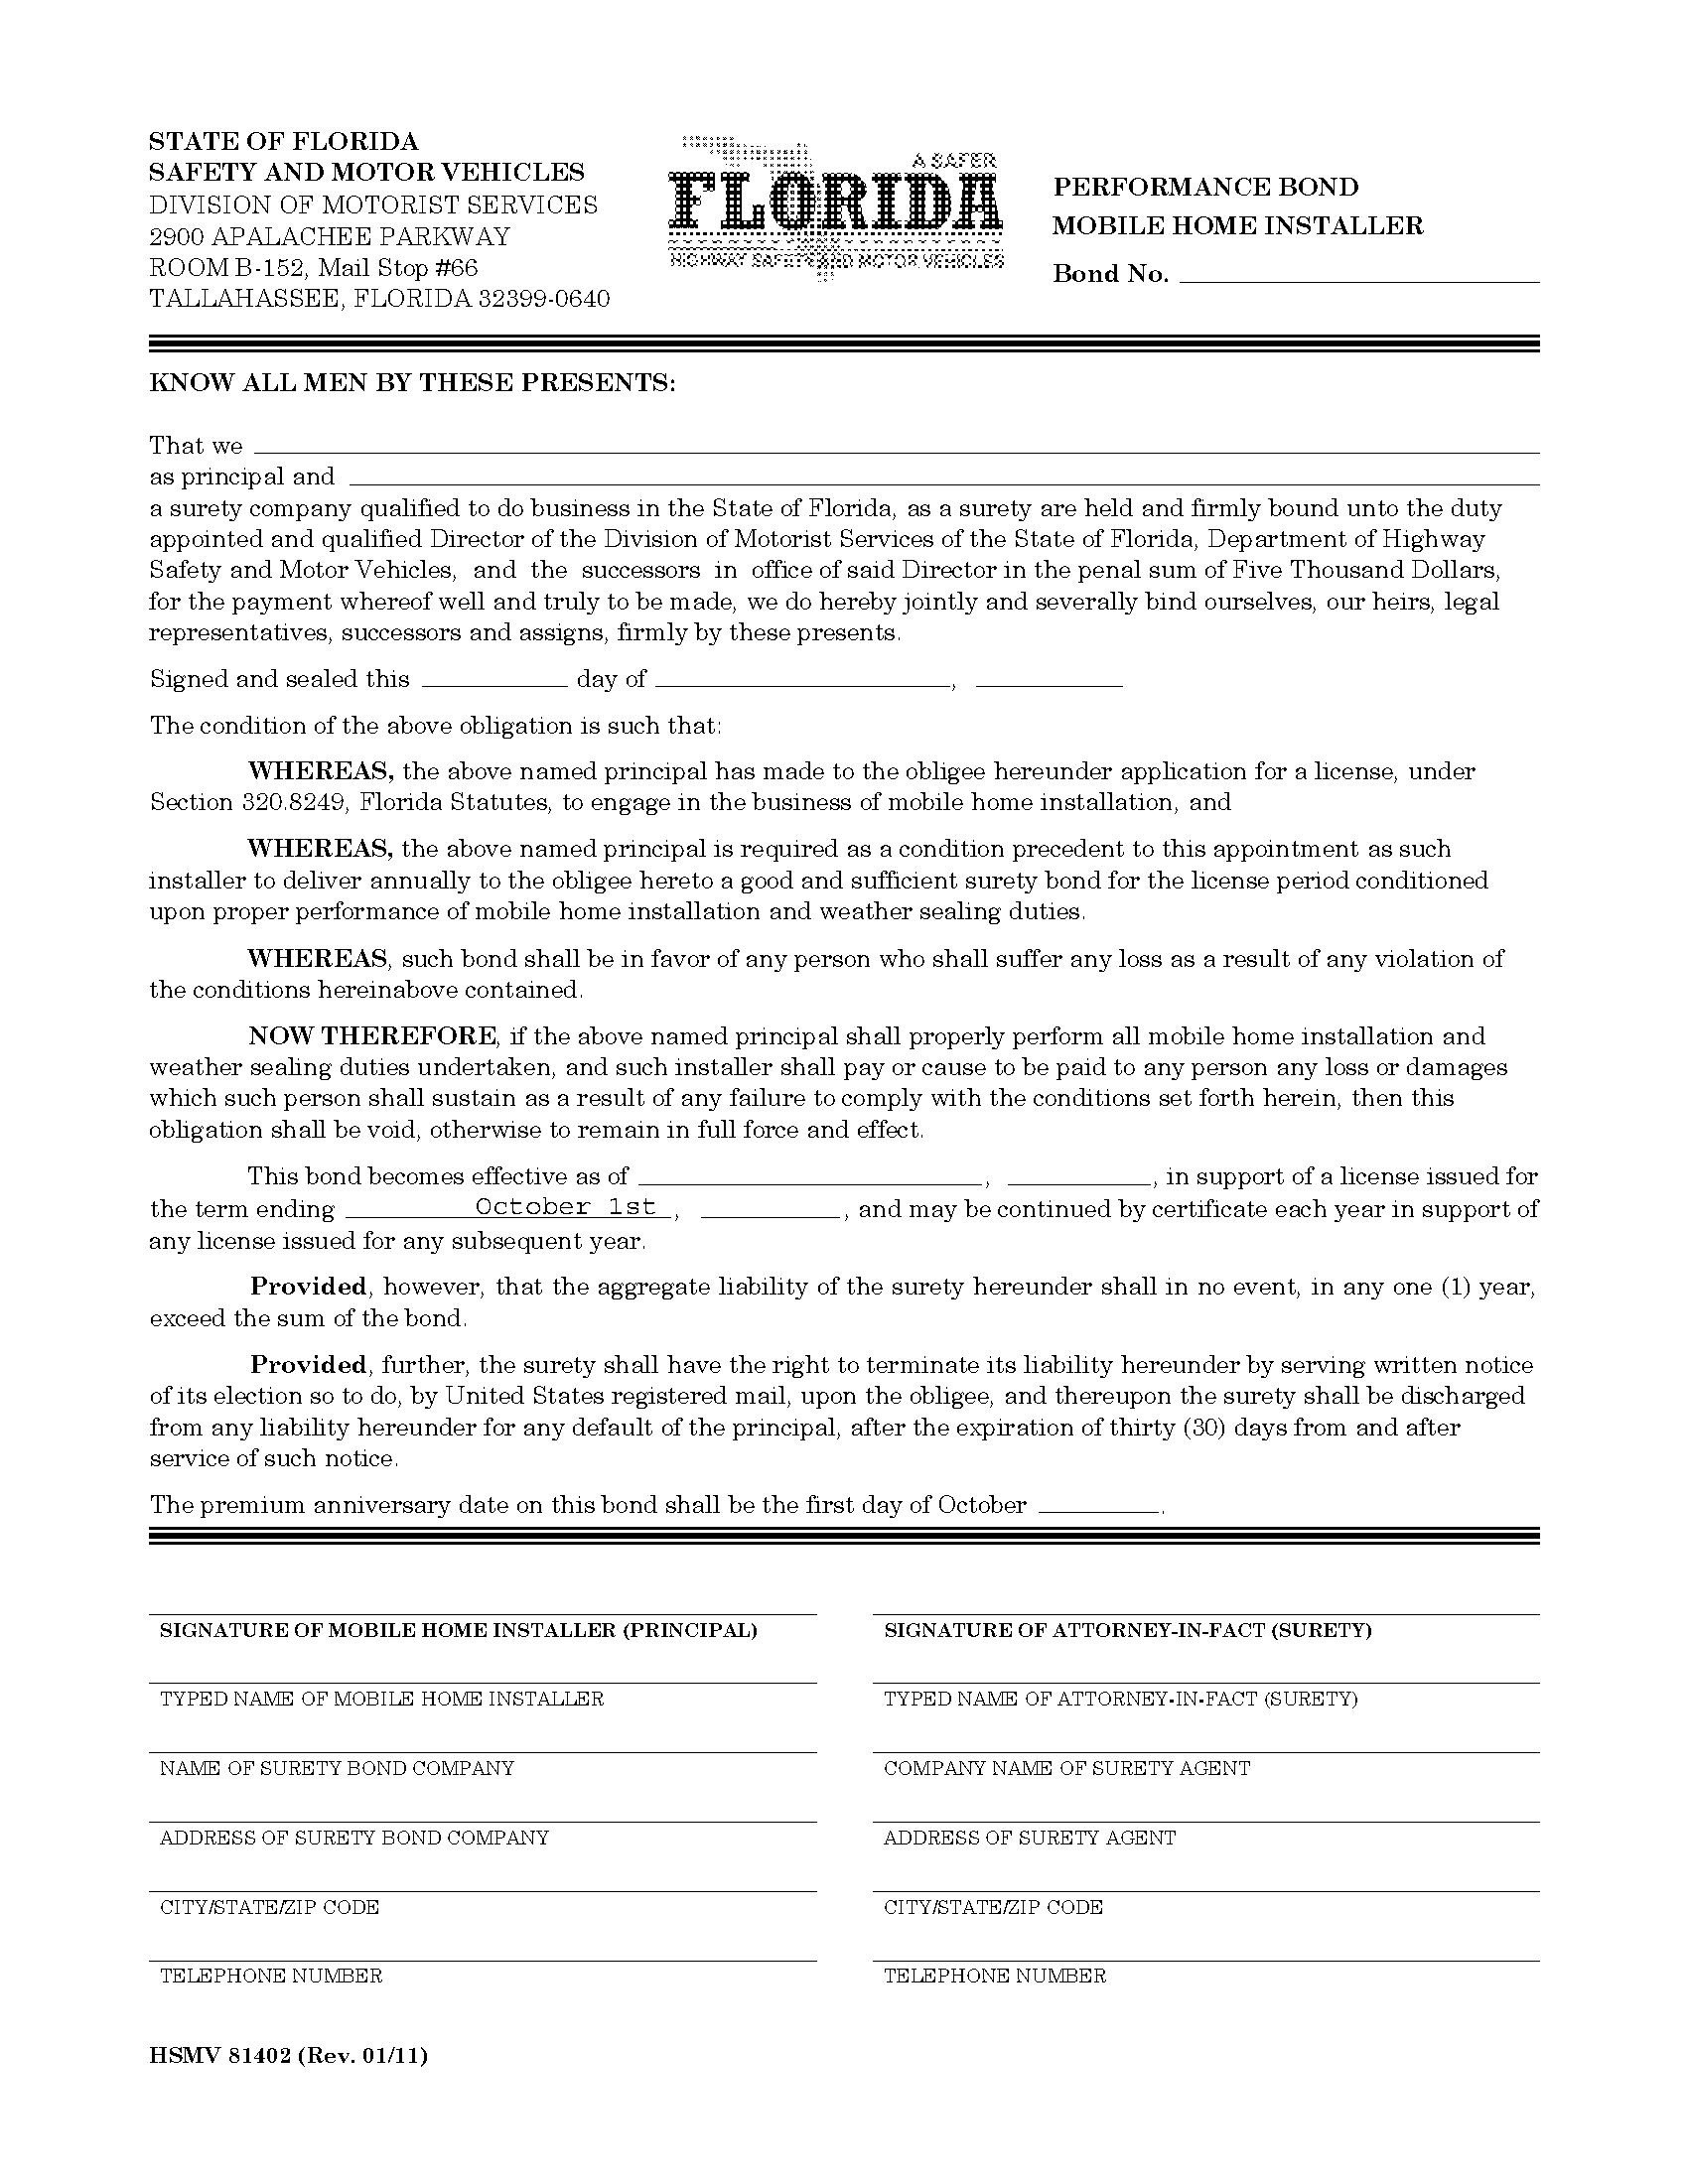 State of Florida Mobile Home Installer Bond sample image